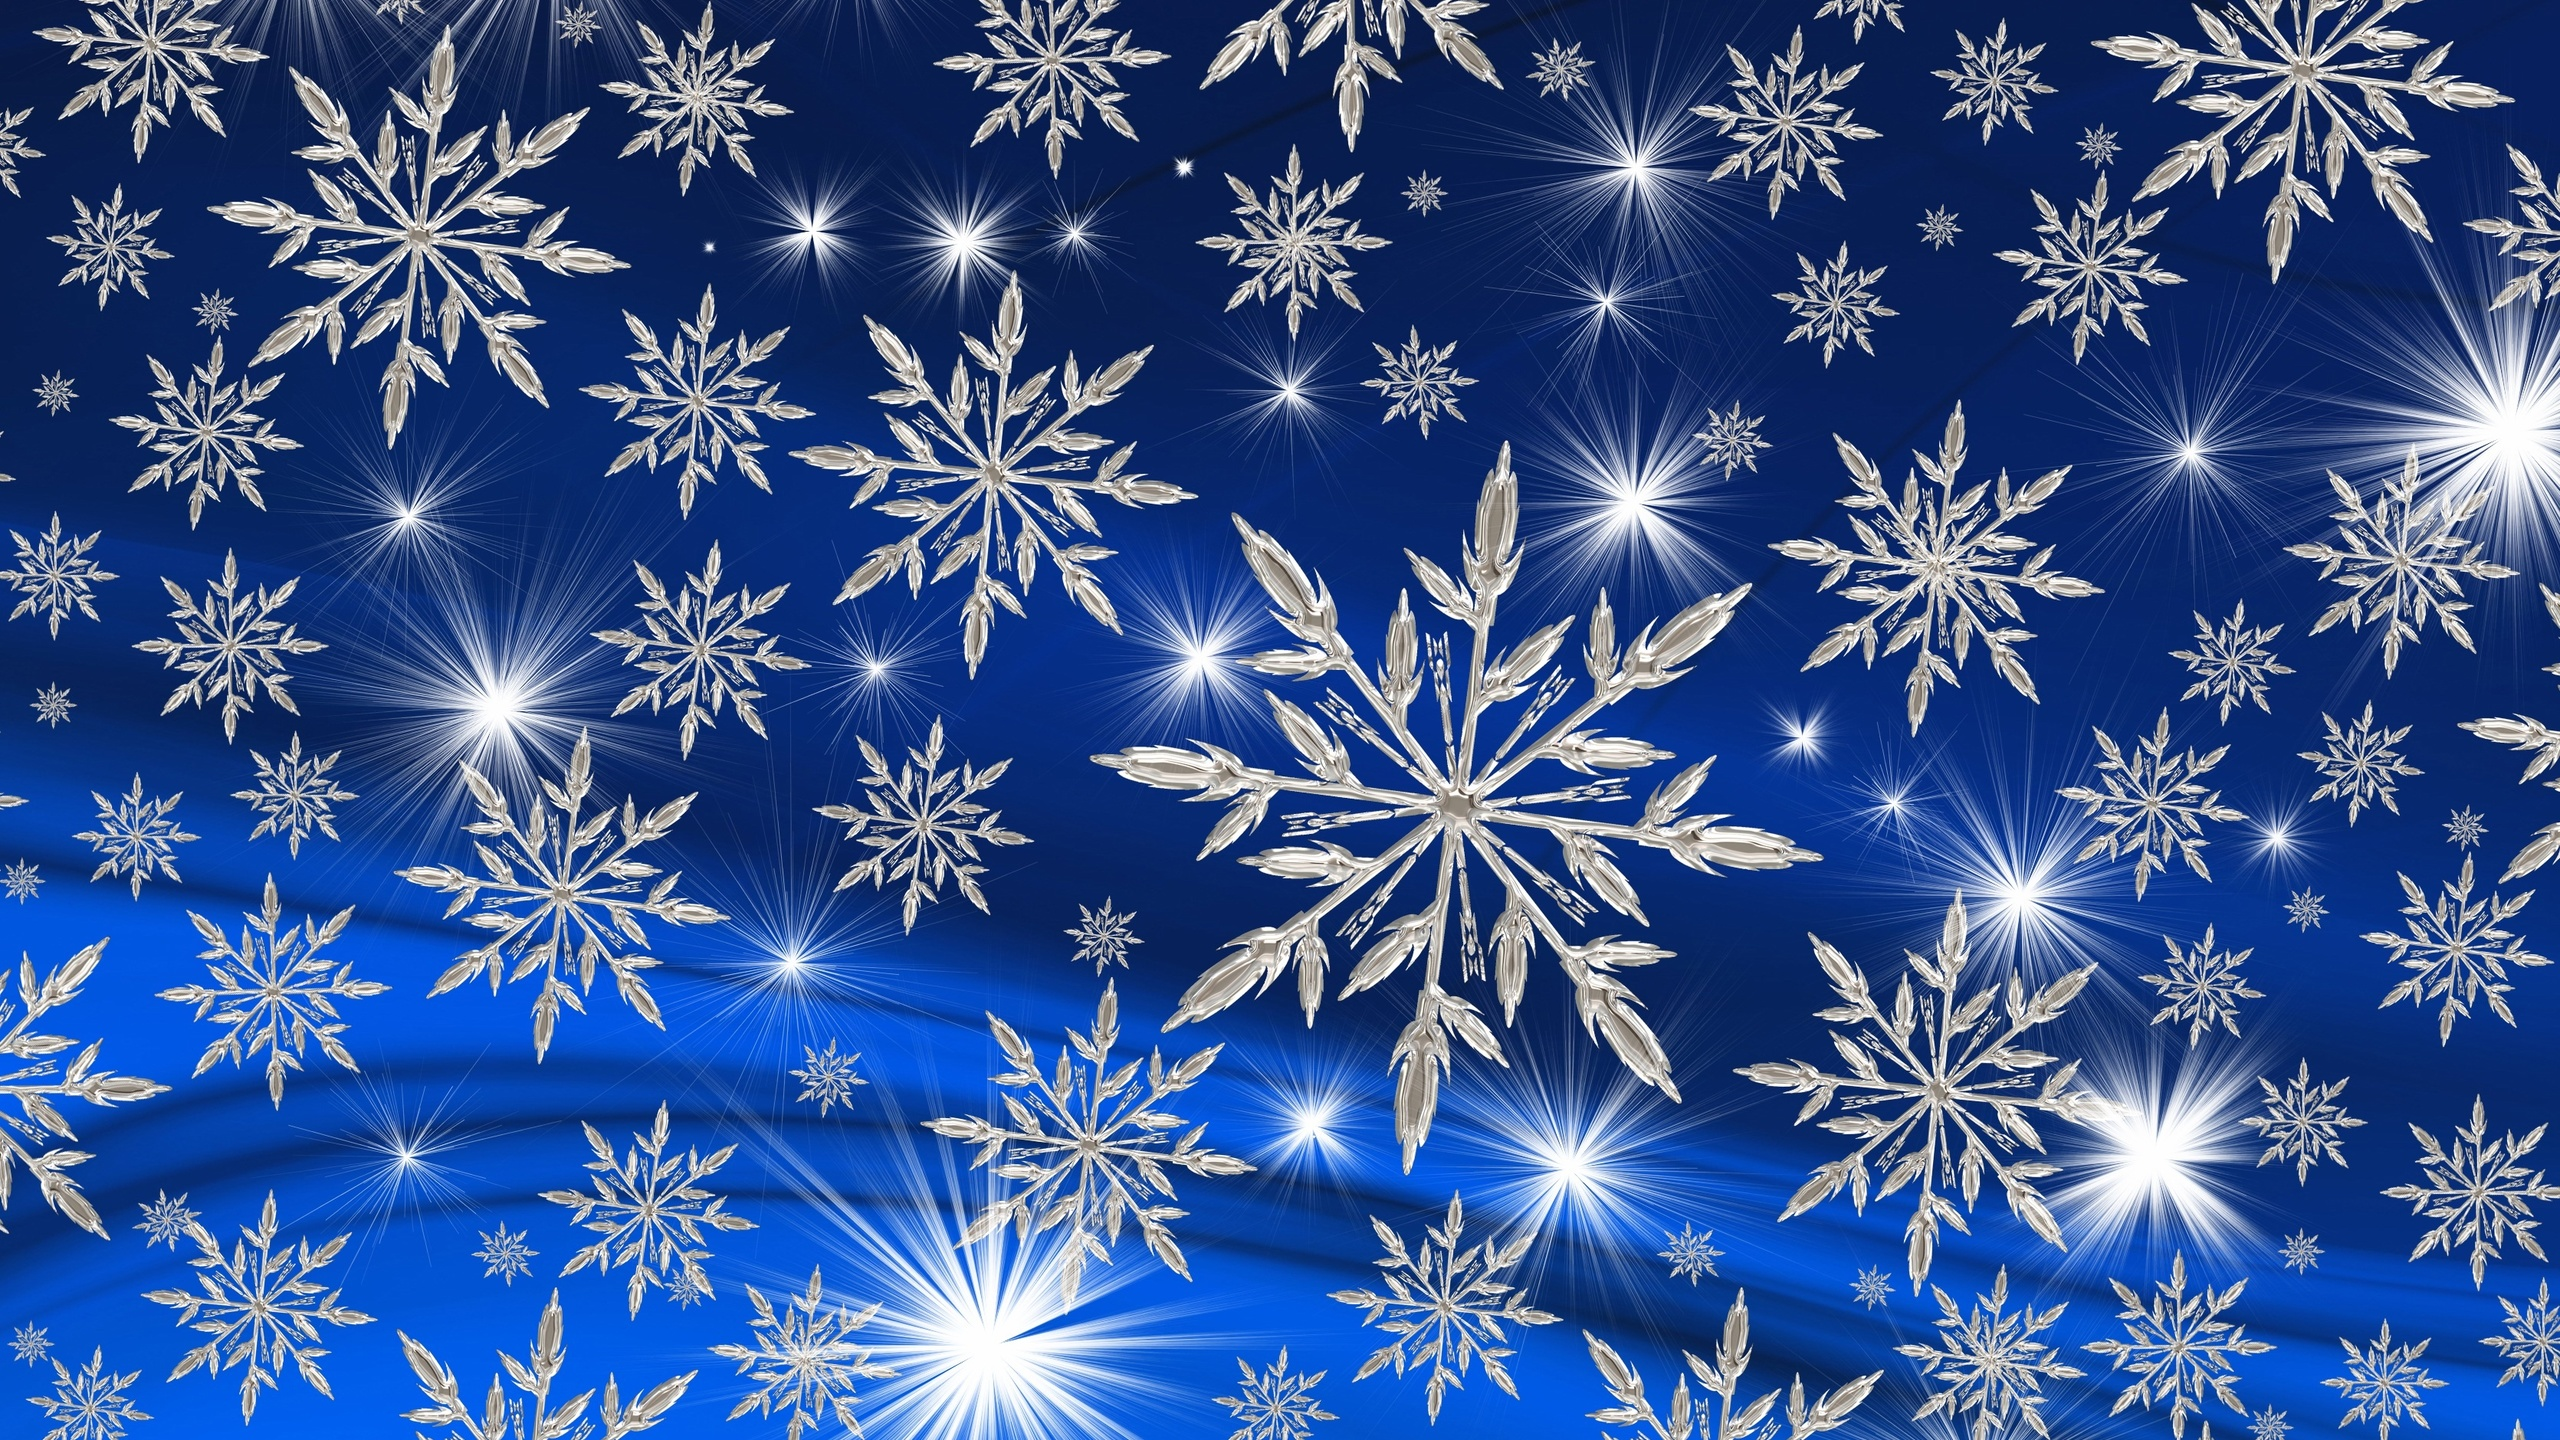 Картинка снежинки падают с неба